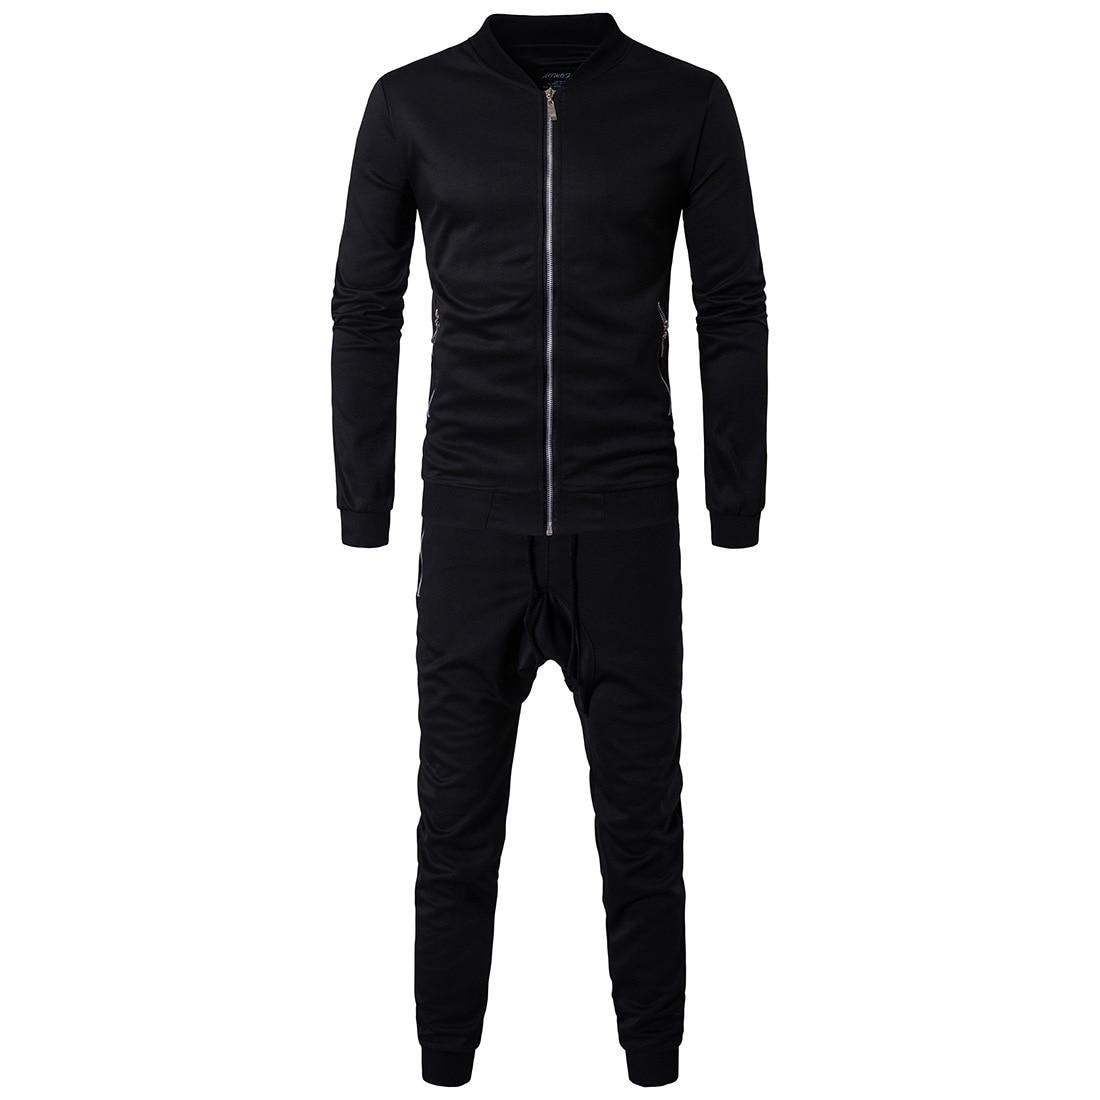 2017 Autumn Clothing New Style Men Hoodie Suit Sports Casual Solid Color Coat Leisure Suit Men's